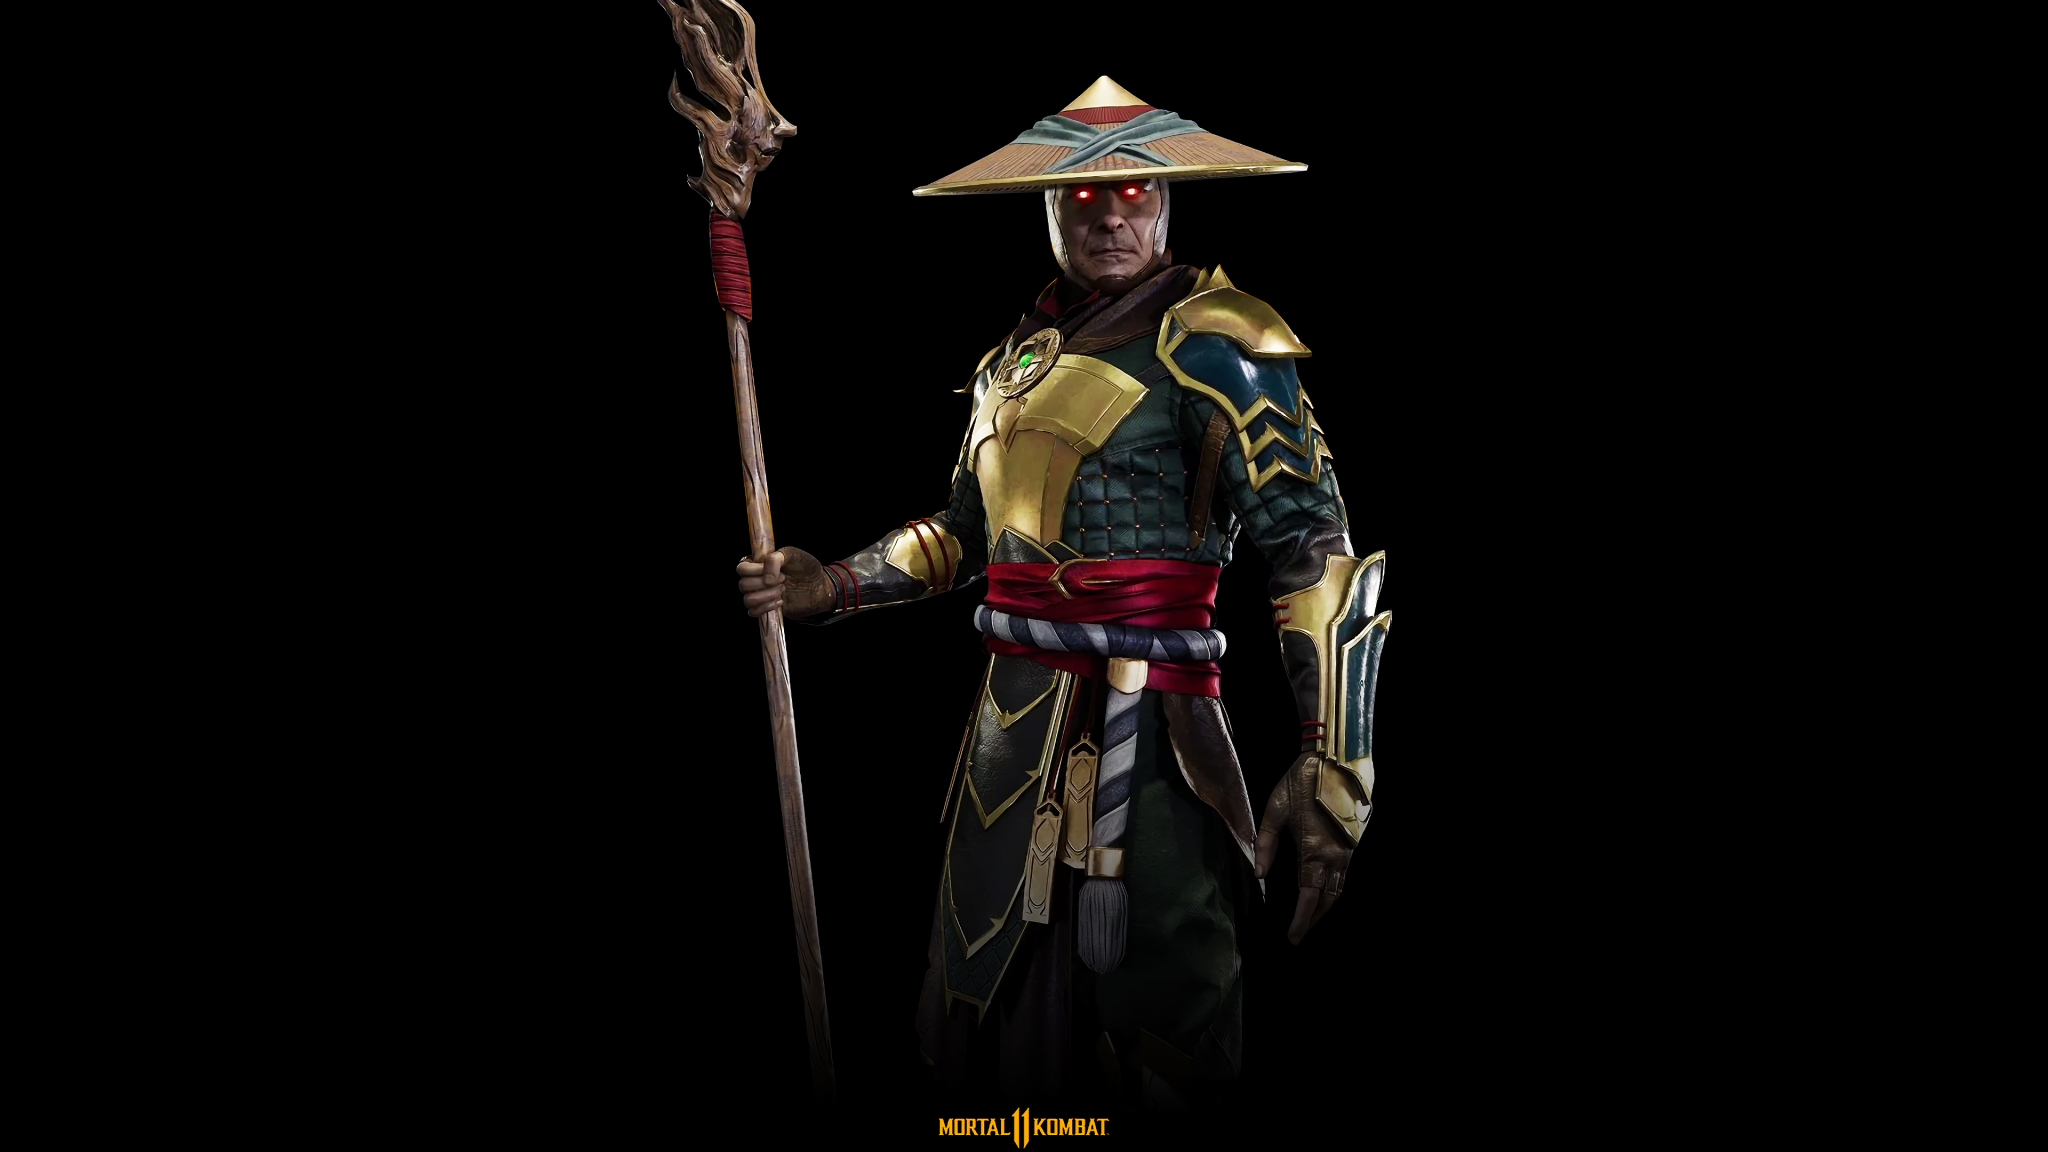 2048x1152 Raiden Mortal Kombat 11 4k 2048x1152 Resolution